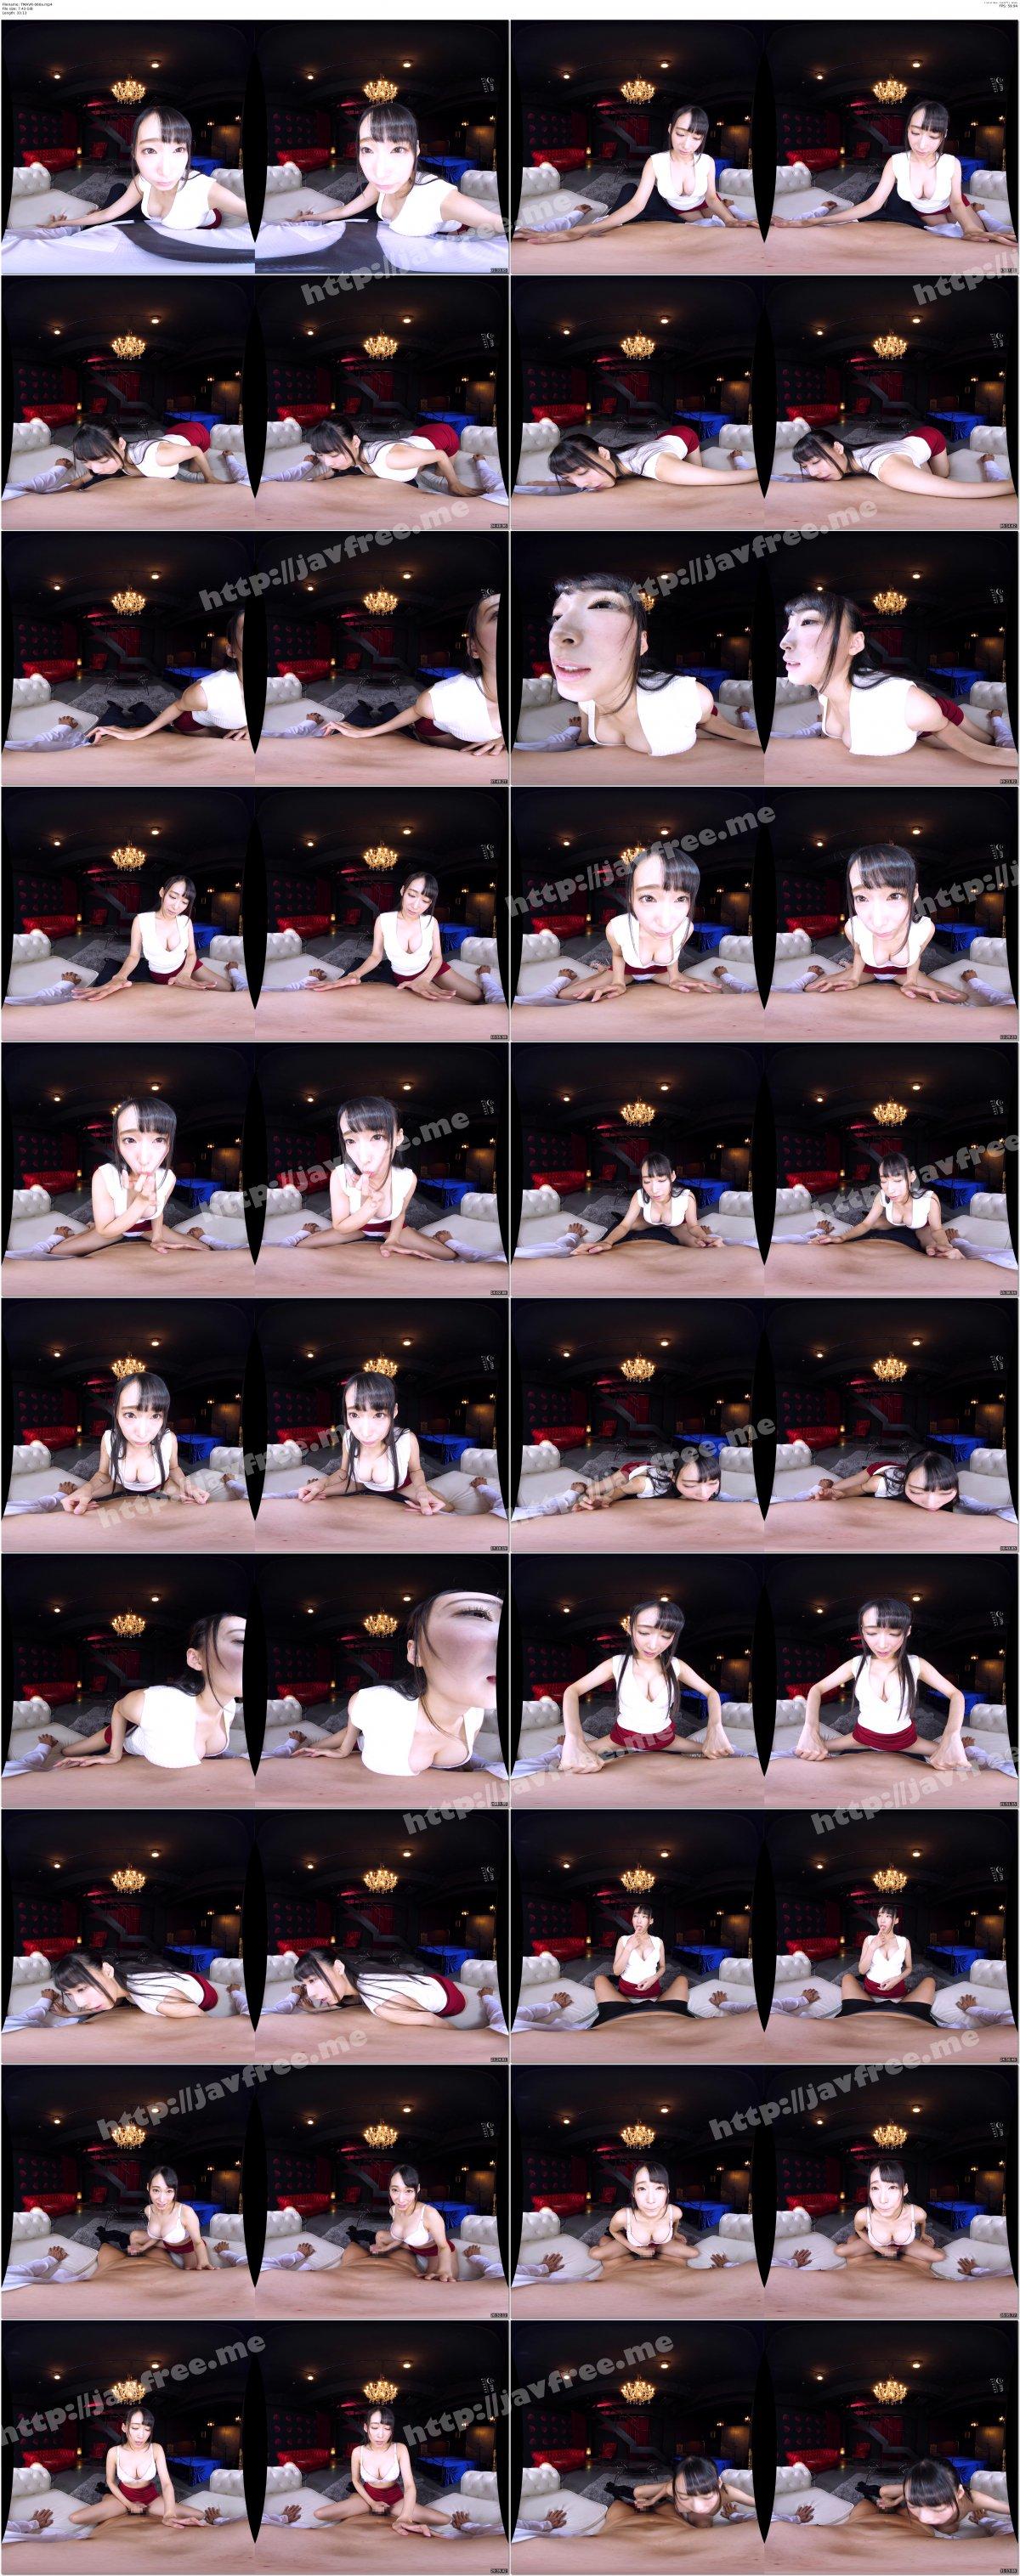 [TMAVR-060] 【VR】長尺VR 蓮実クレアがあなたのチクニーたすけてア・ゲ・ル◆ - image TMAVR-060a on https://javfree.me